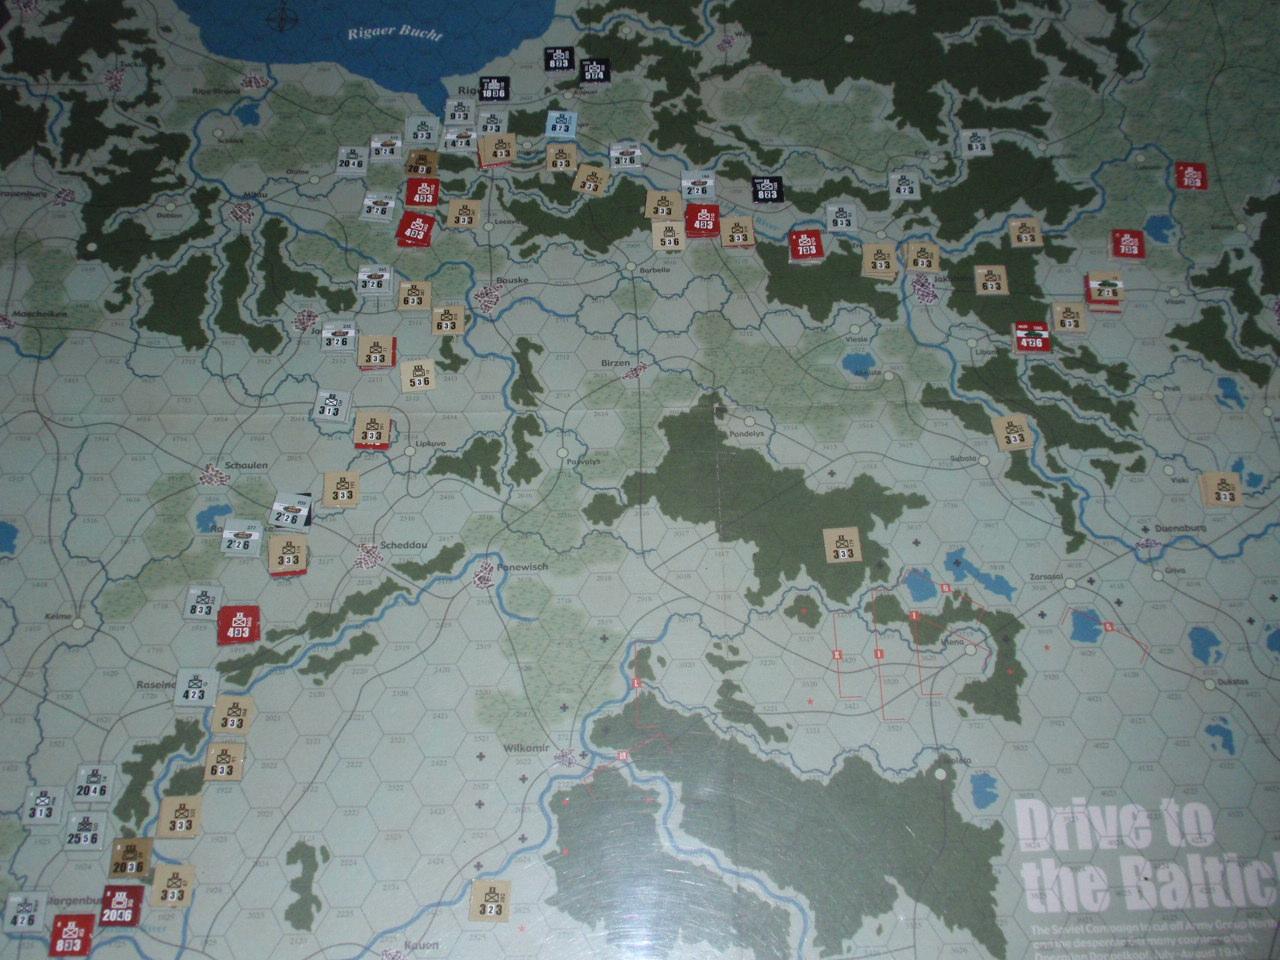 MIH/CMJ「Drive to the Baltic!」をソロプレイ③_b0162202_10431995.jpg